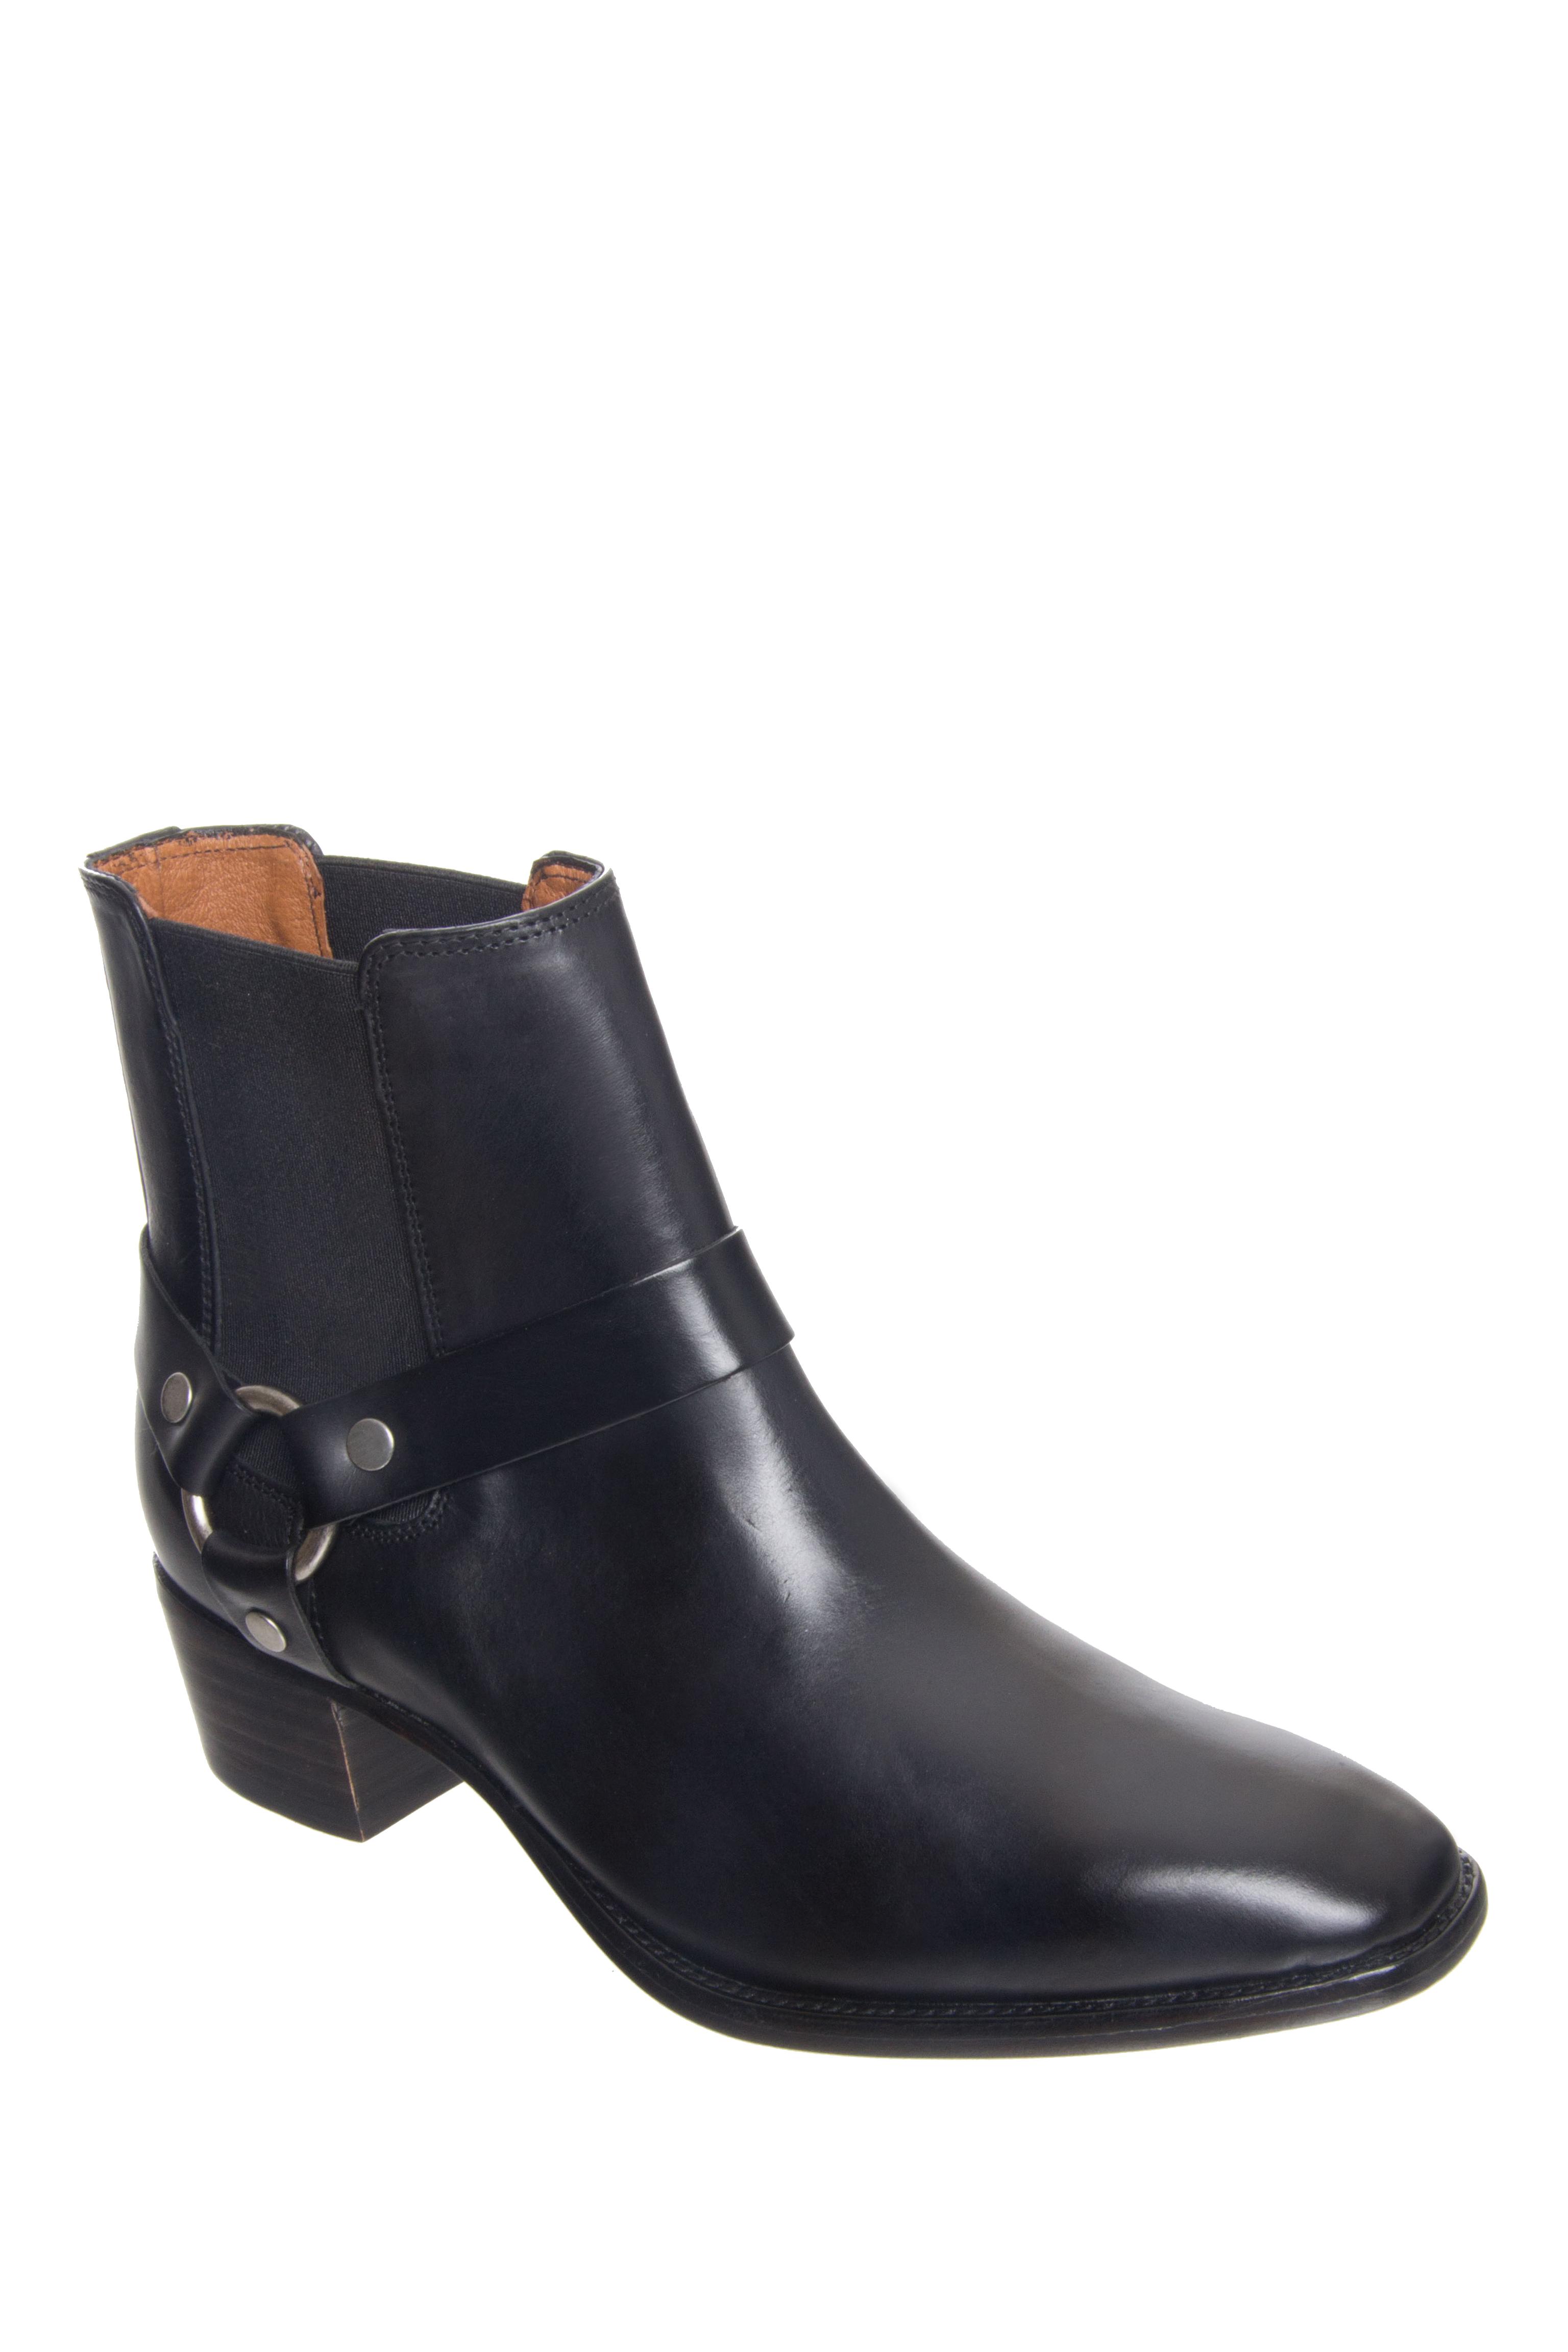 Frye Dara Harness Chelsea Mid Heel Boots - Black